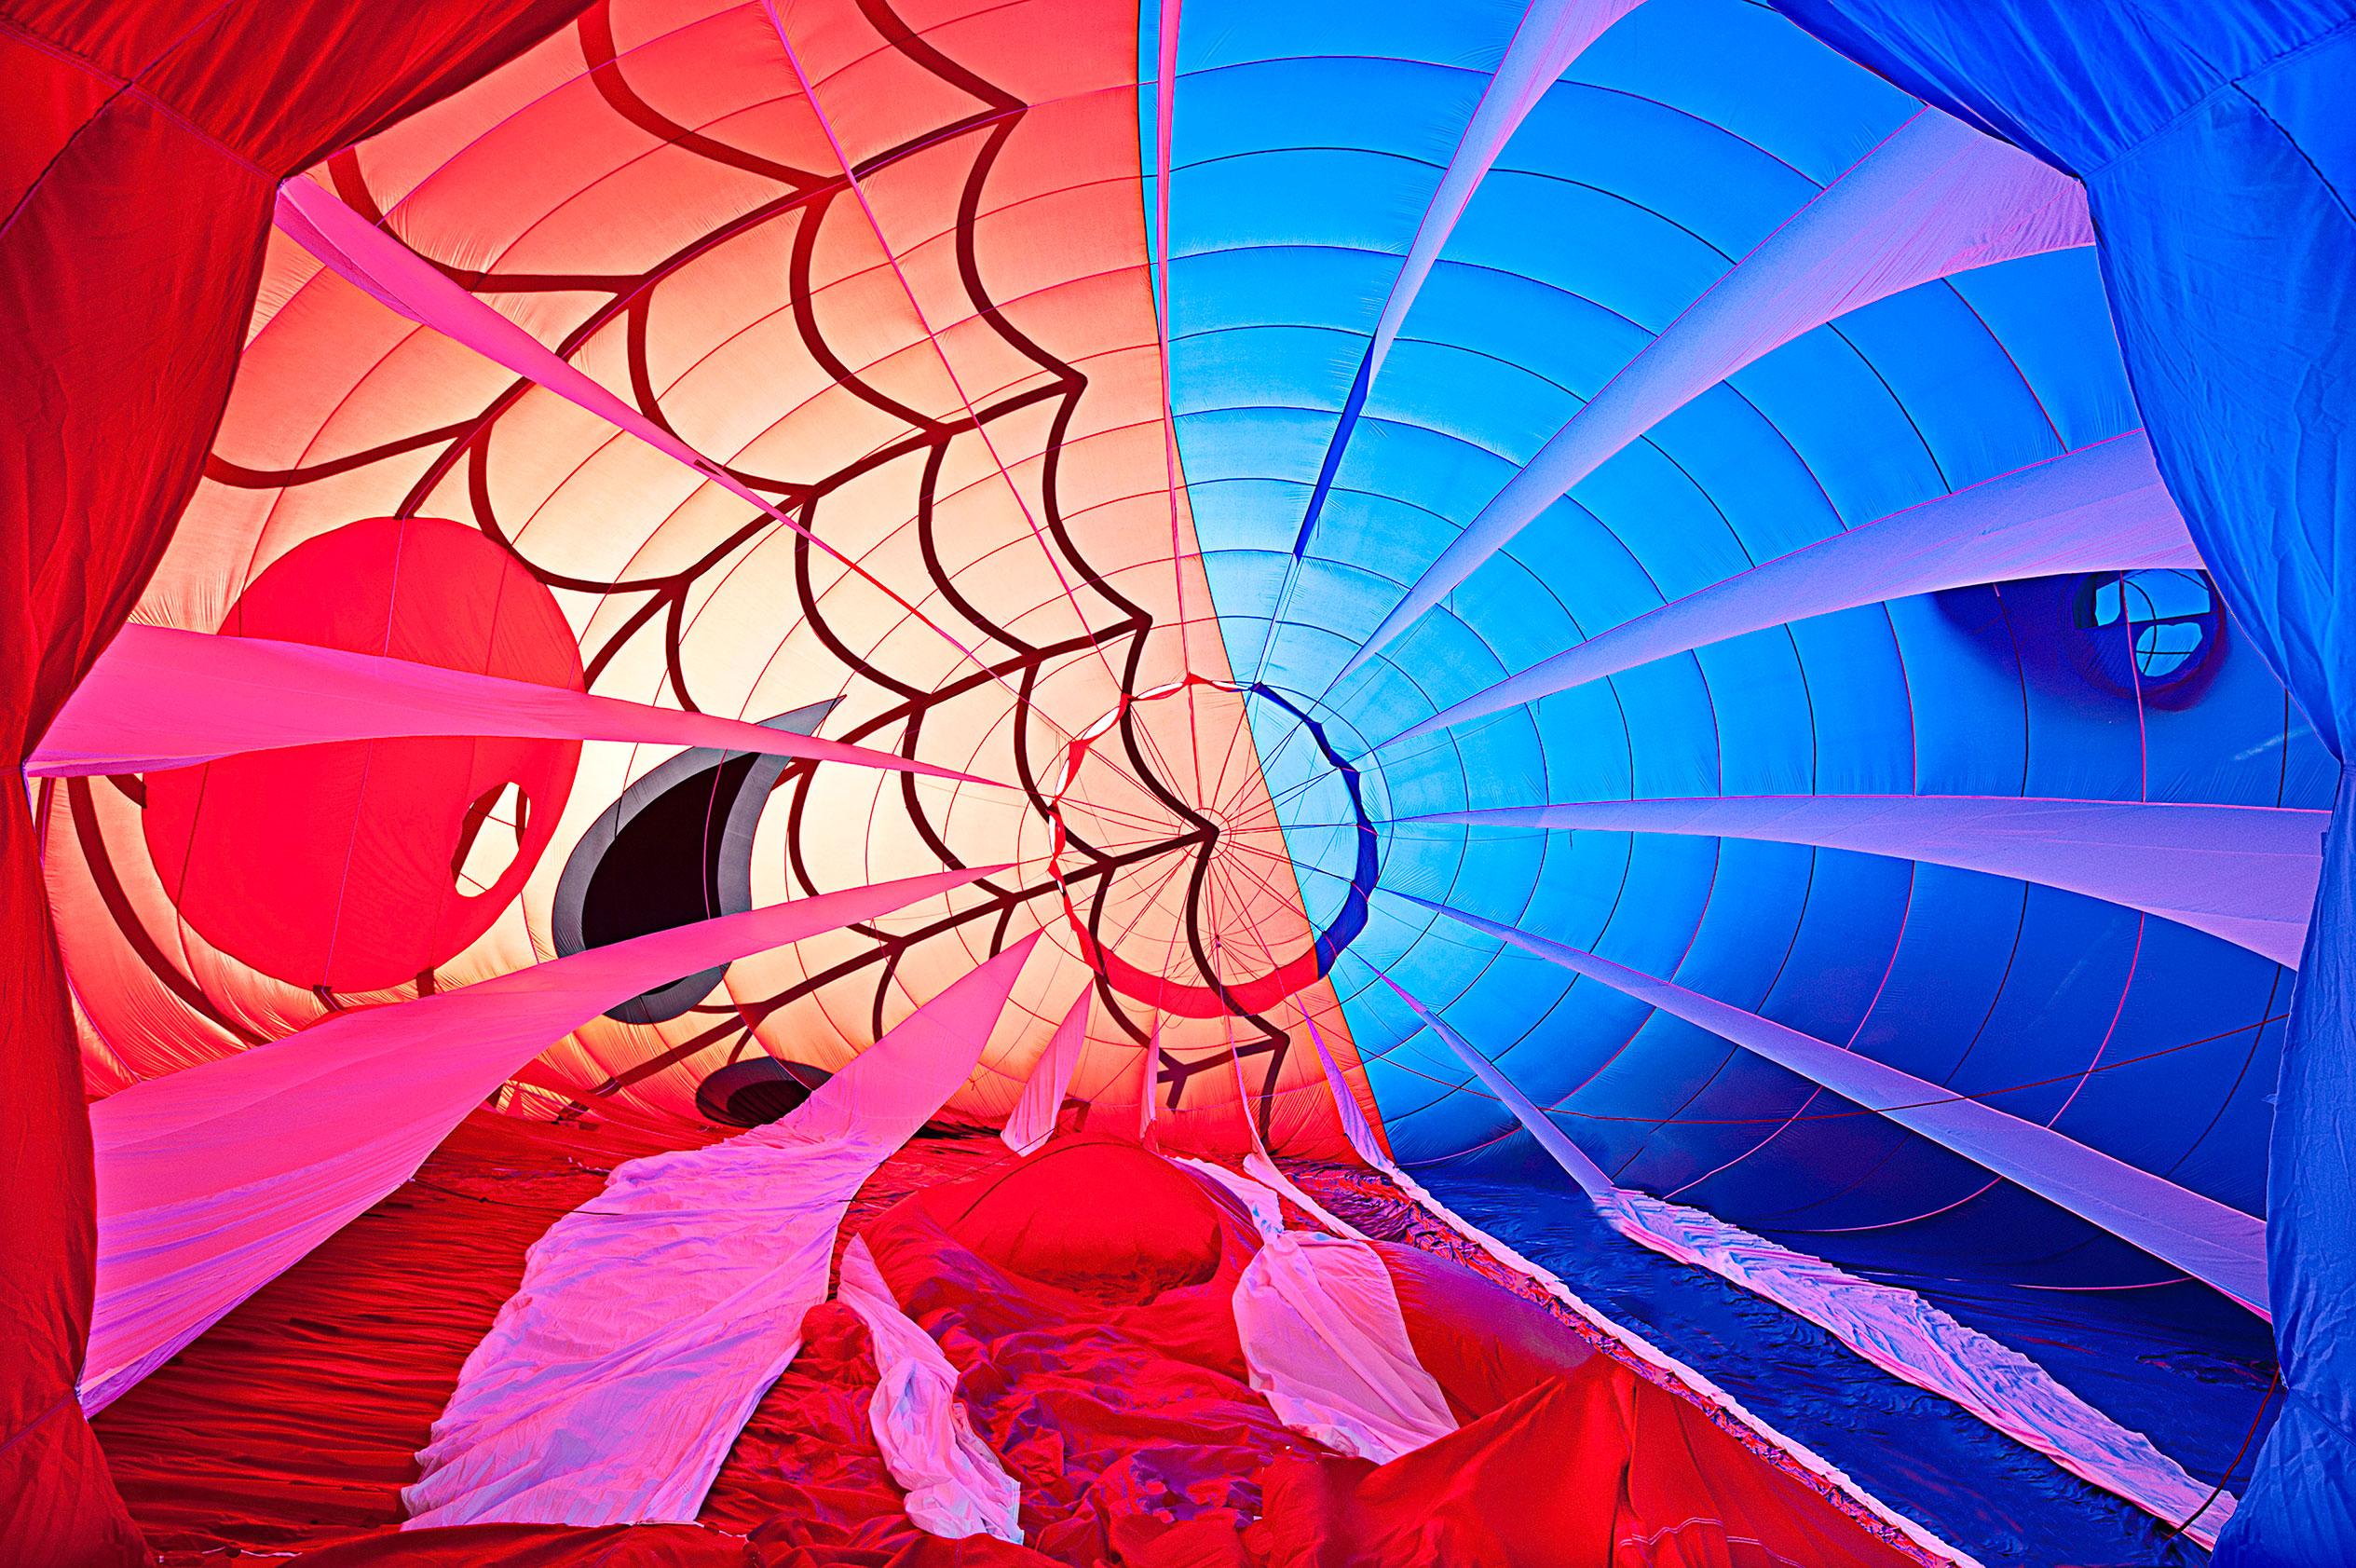 Donald Polzo, Inside Spider Man